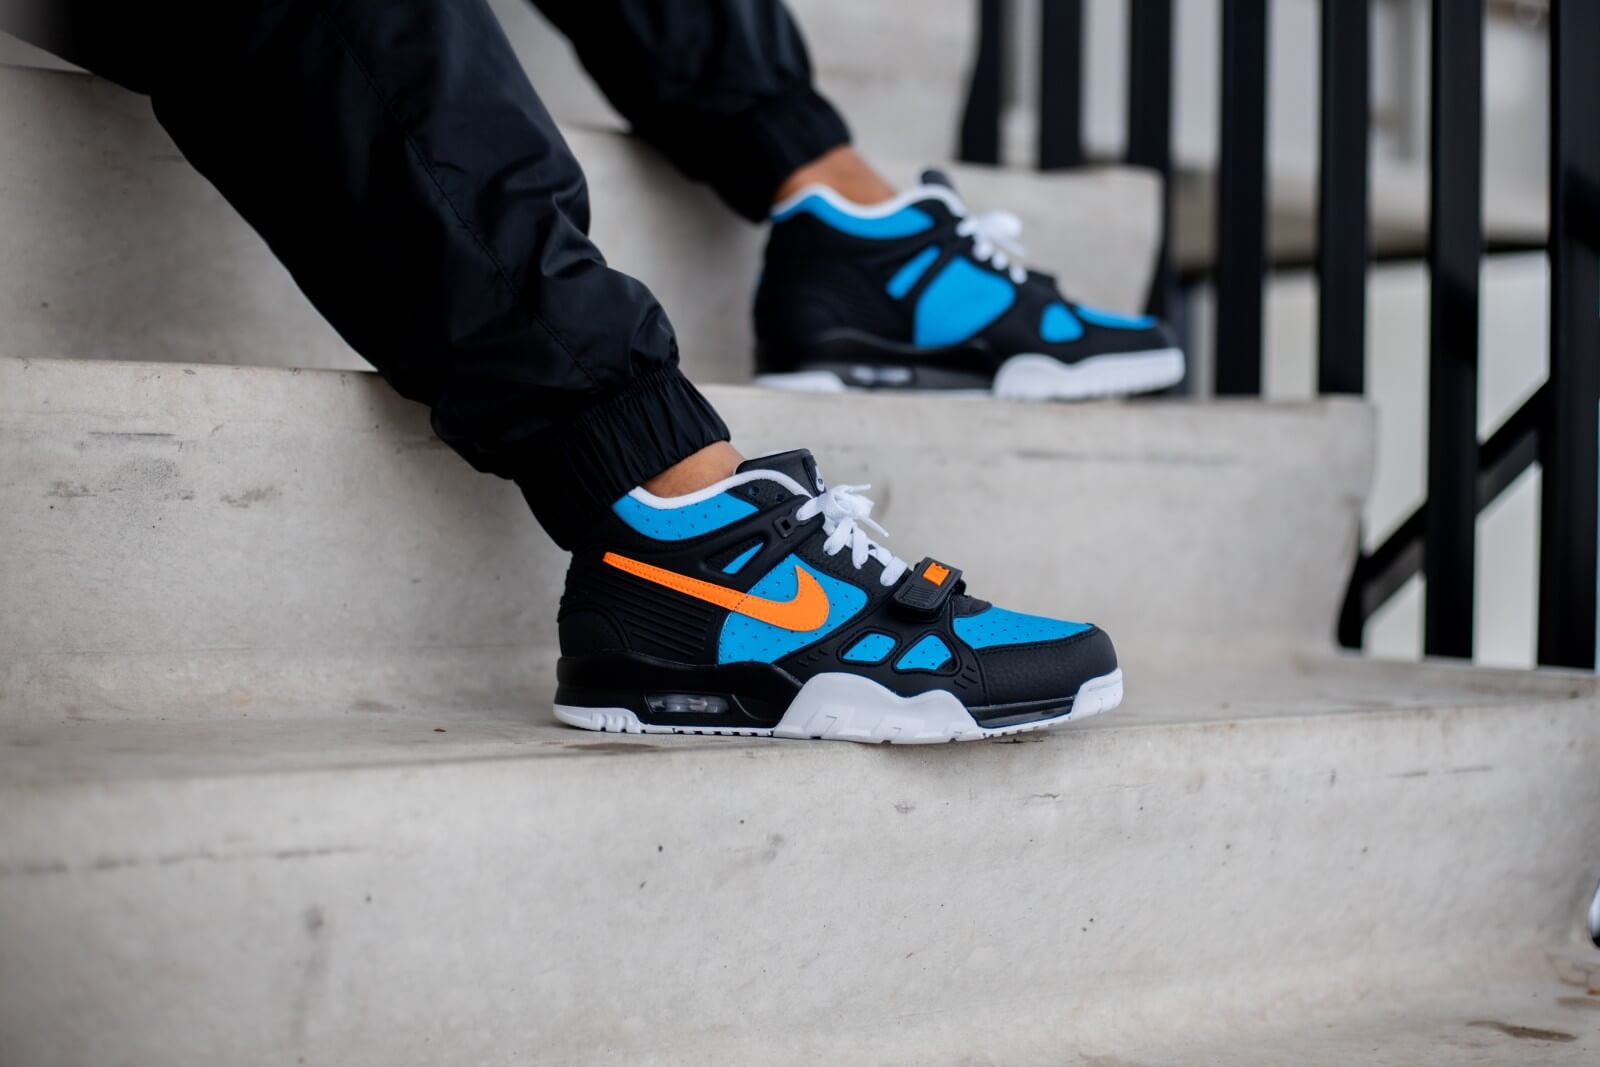 Nike Air Trainer 3 Black/Total Orange